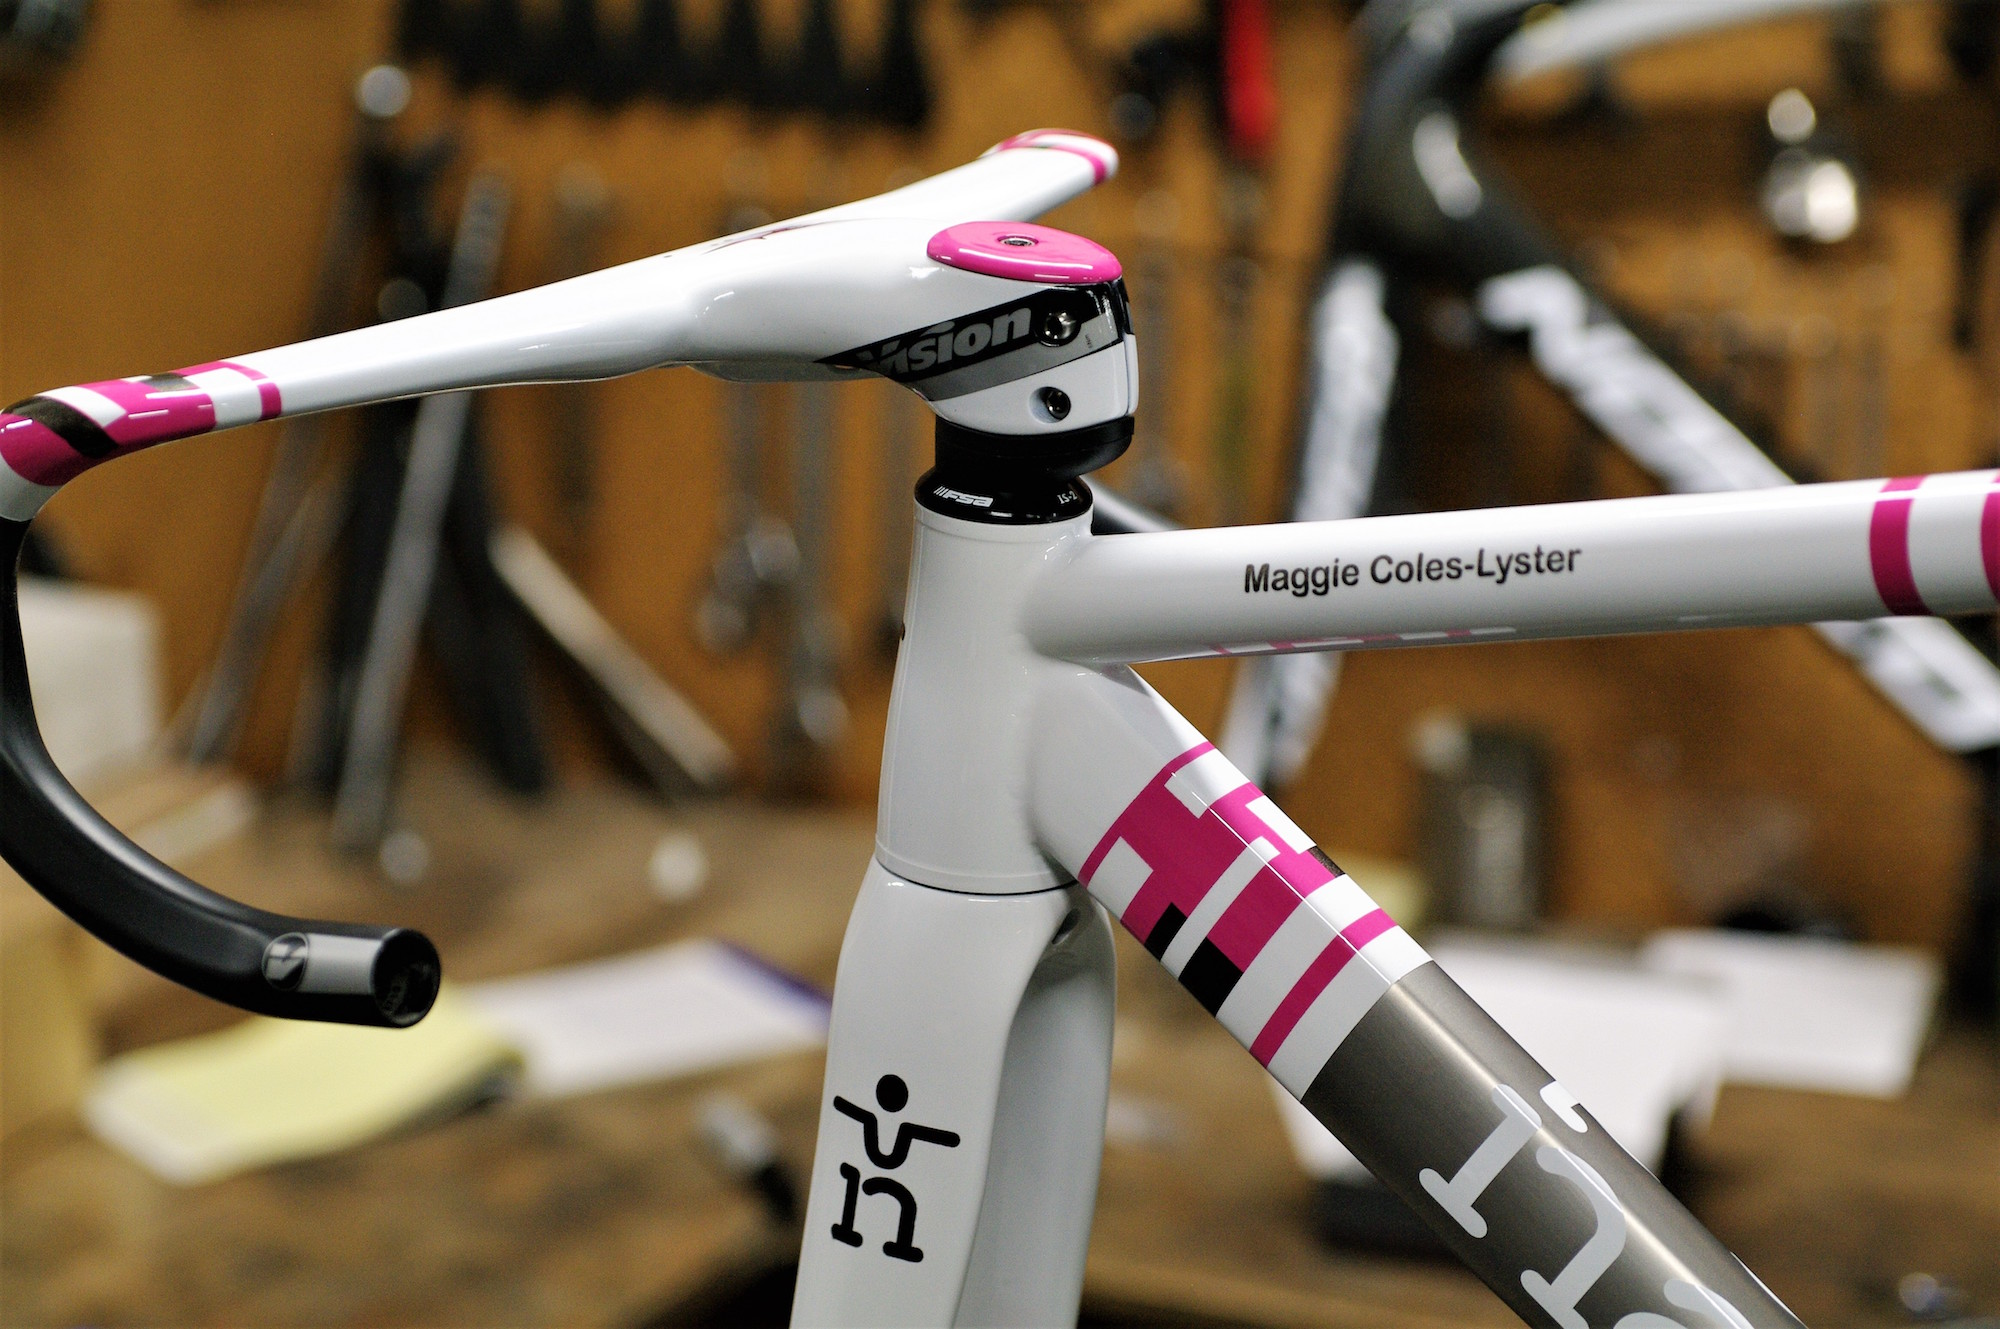 Maggie Coles-Lyster Elle Pirahna Track bike